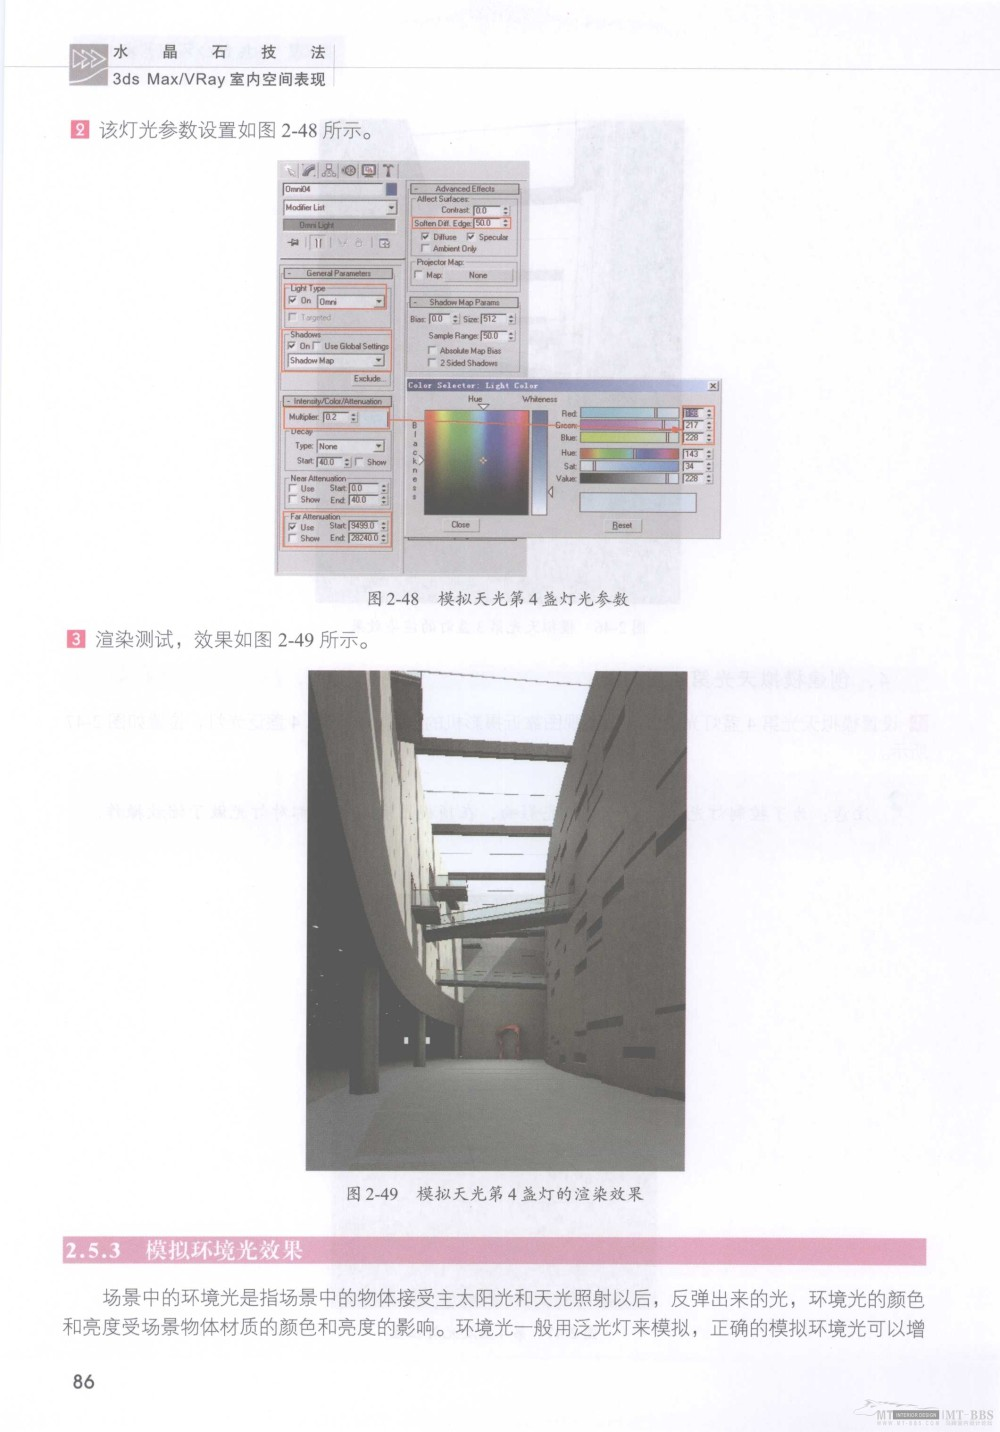 水晶石技法-3ds_Max&VRay室内空间表现_水晶石技法-3ds_Max&VRay室内空间表现_页面_092.jpg